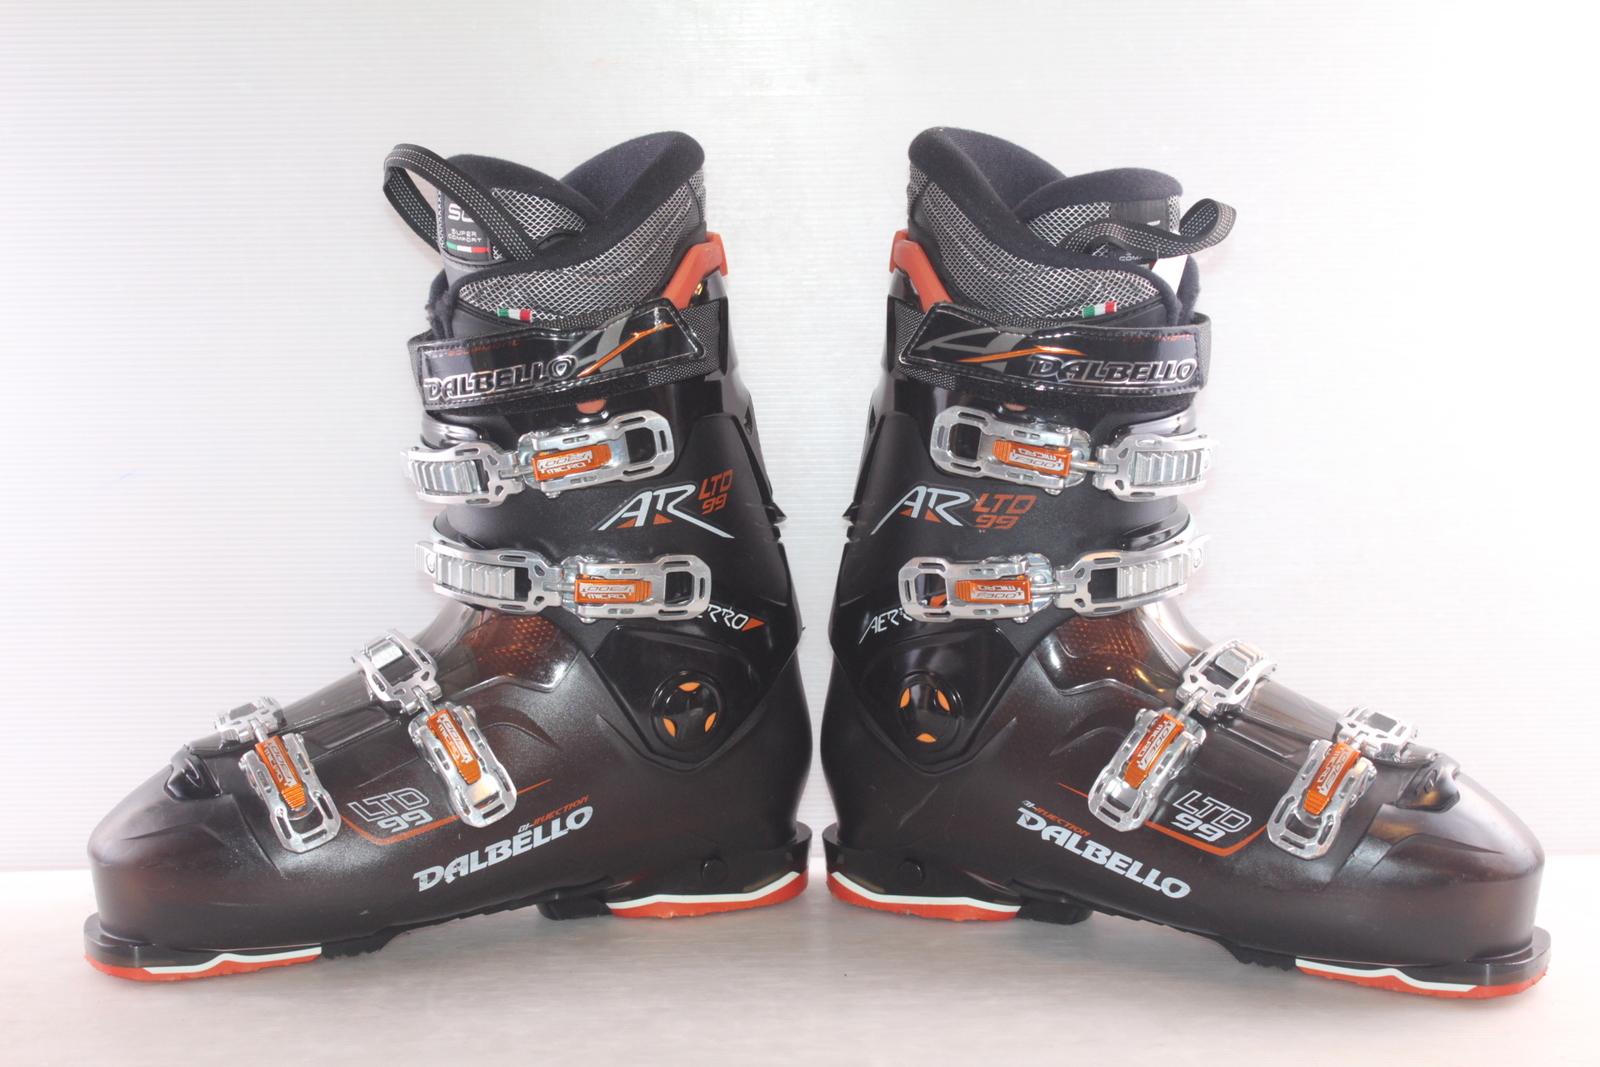 Lyžařské boty Dalbello AR Ltd 99 vel. EU46 flexe 90